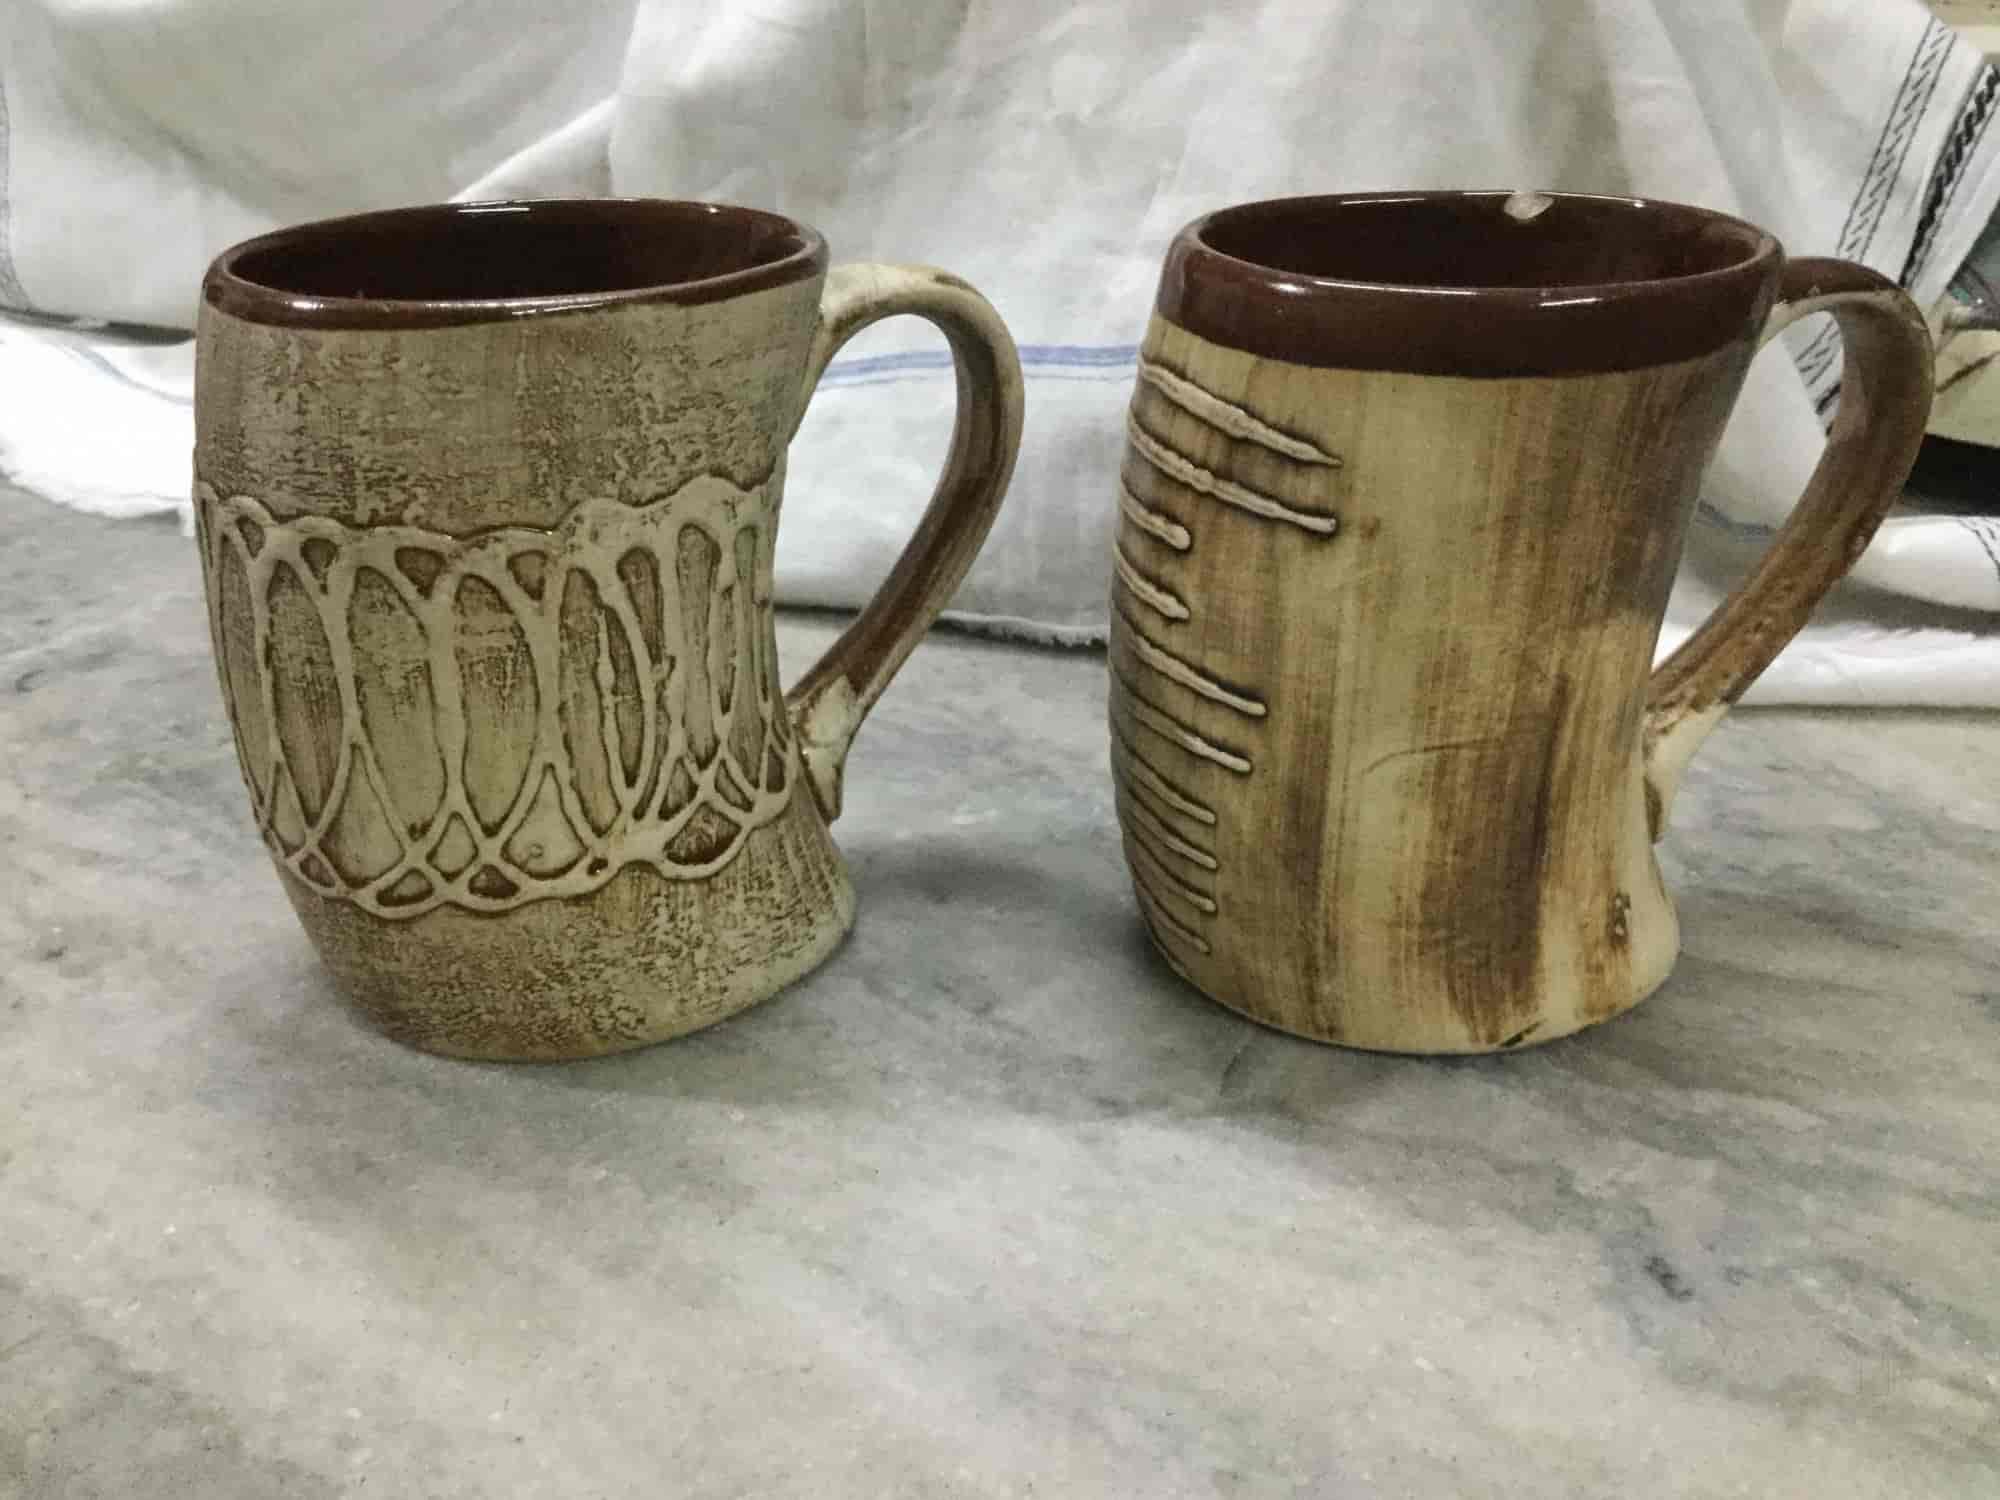 2d4fcf8de67 Zai Ceramic India, Khurja - Handicraft Item Manufacturers in Bulandshahr -  Justdial